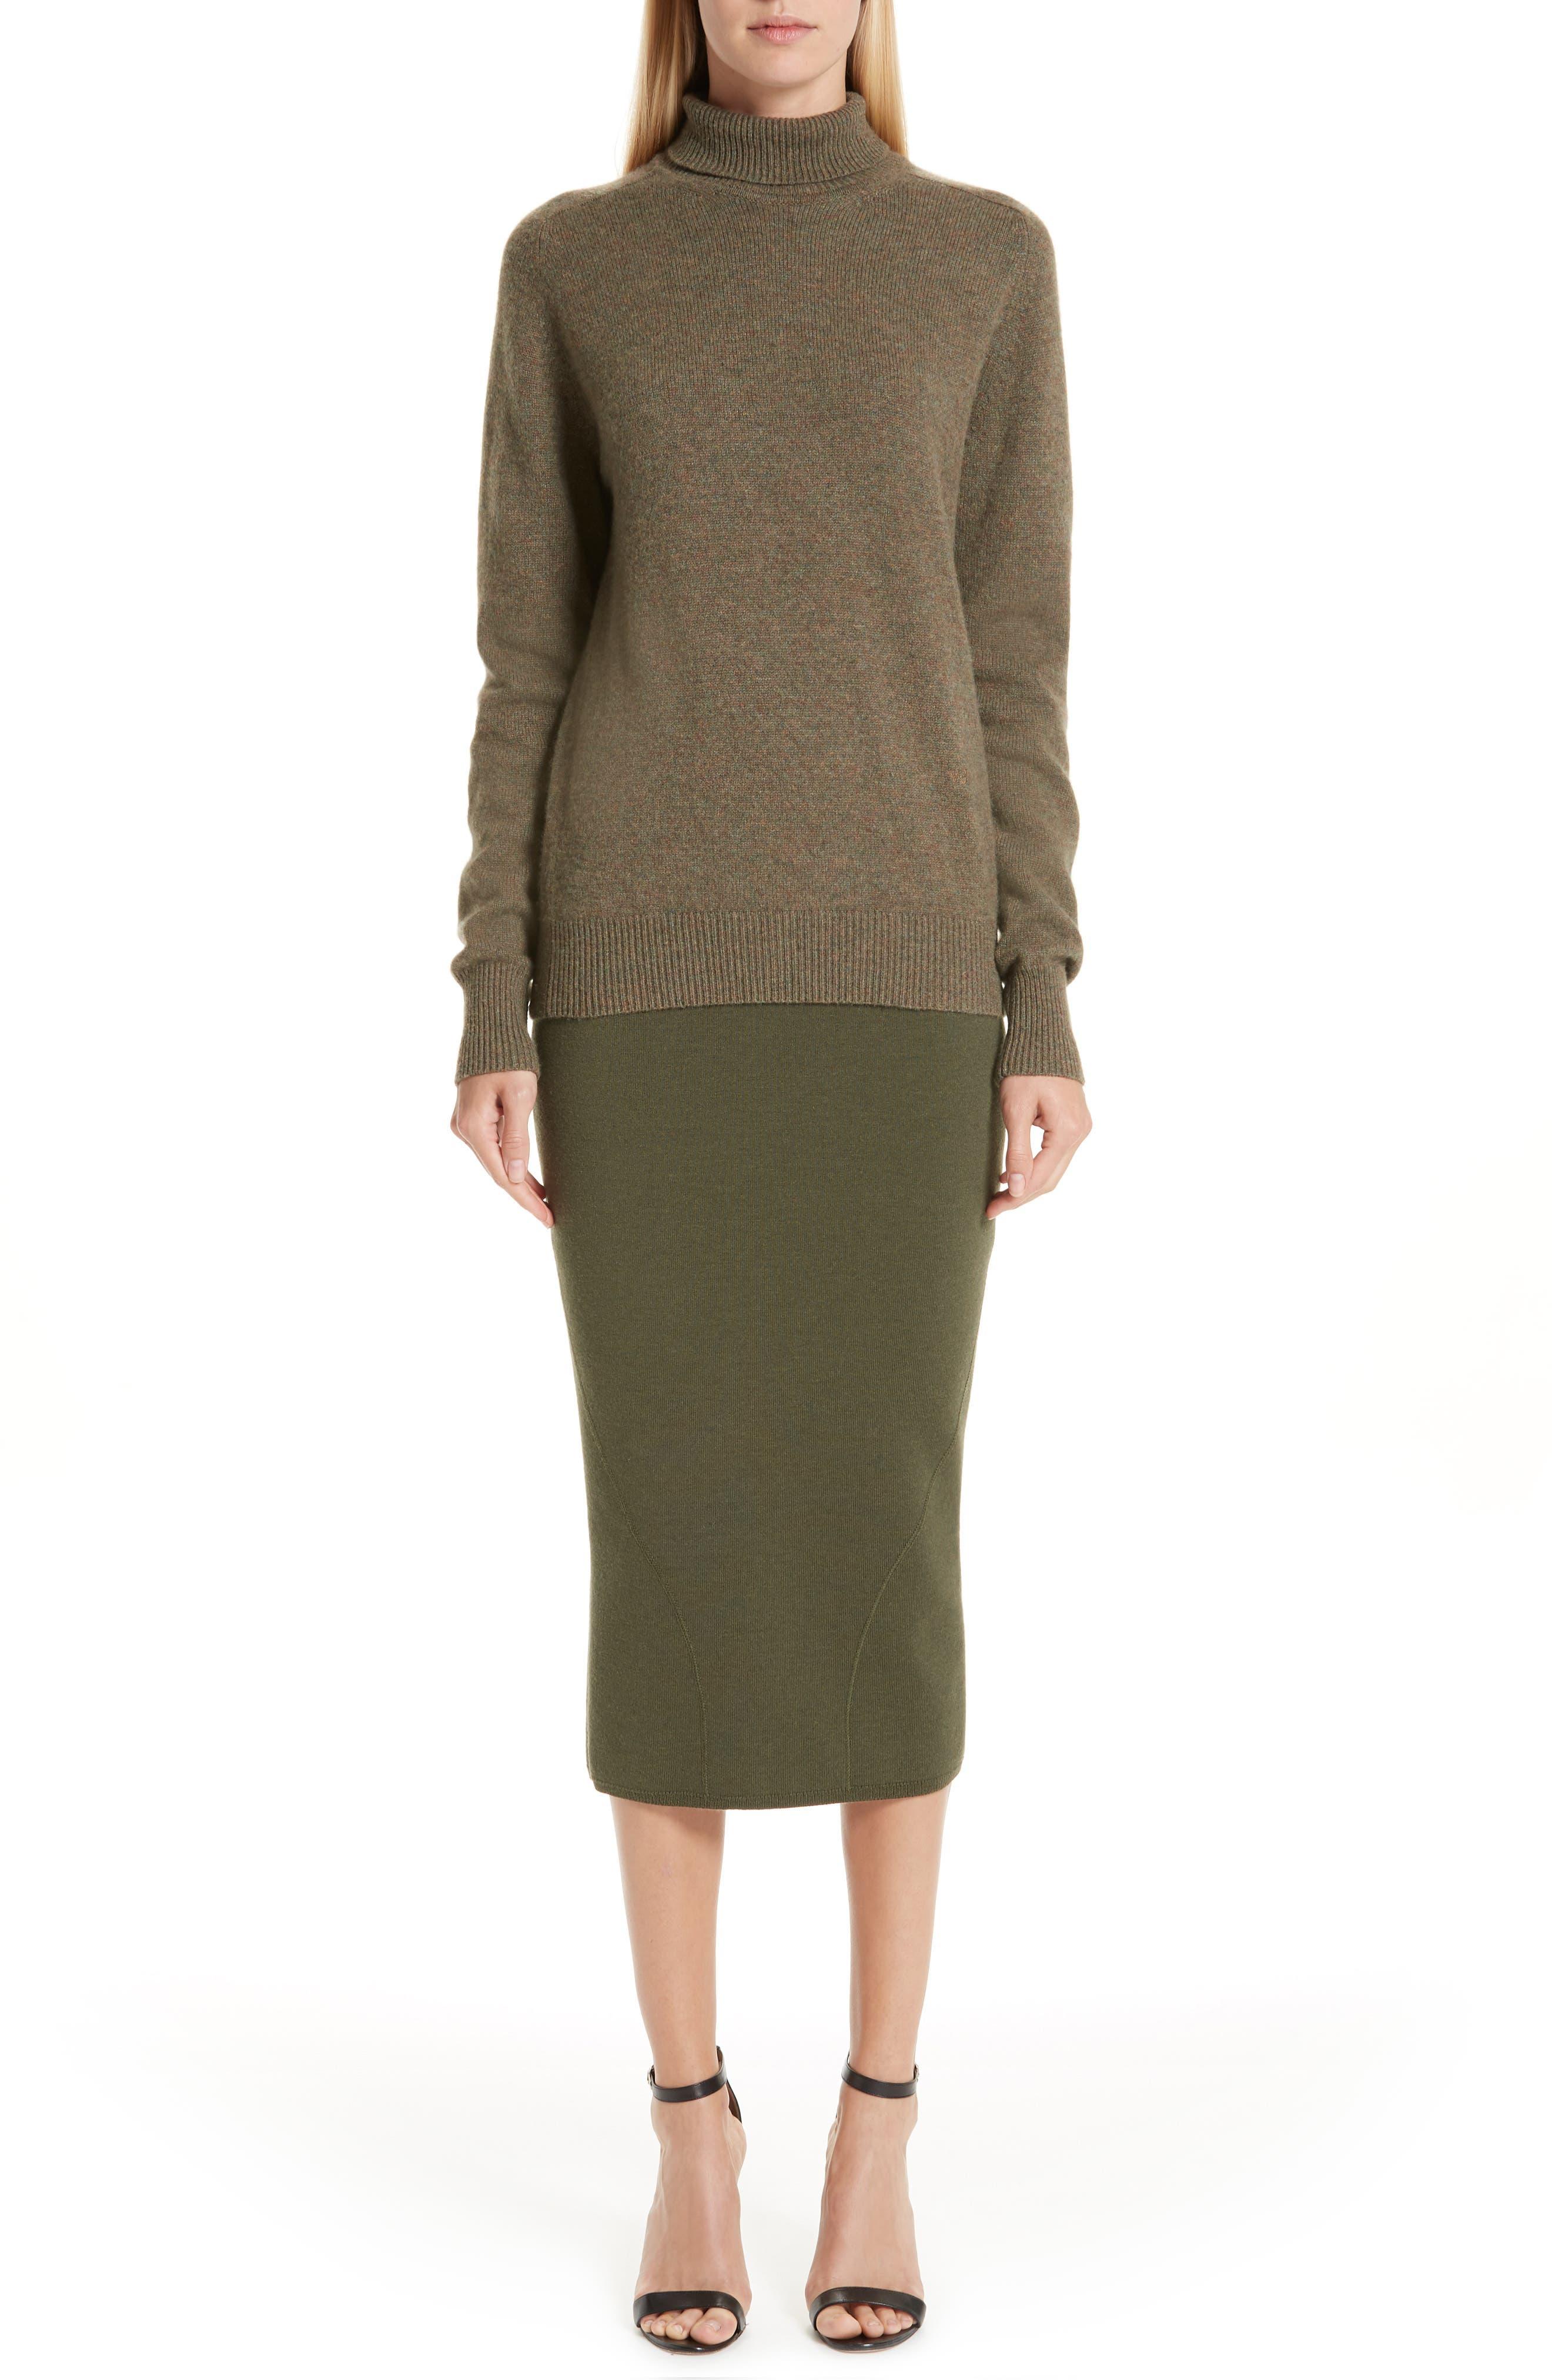 VICTORIA BECKHAM, Stretch Cashmere Turtleneck Sweater, Alternate thumbnail 8, color, OLIVE